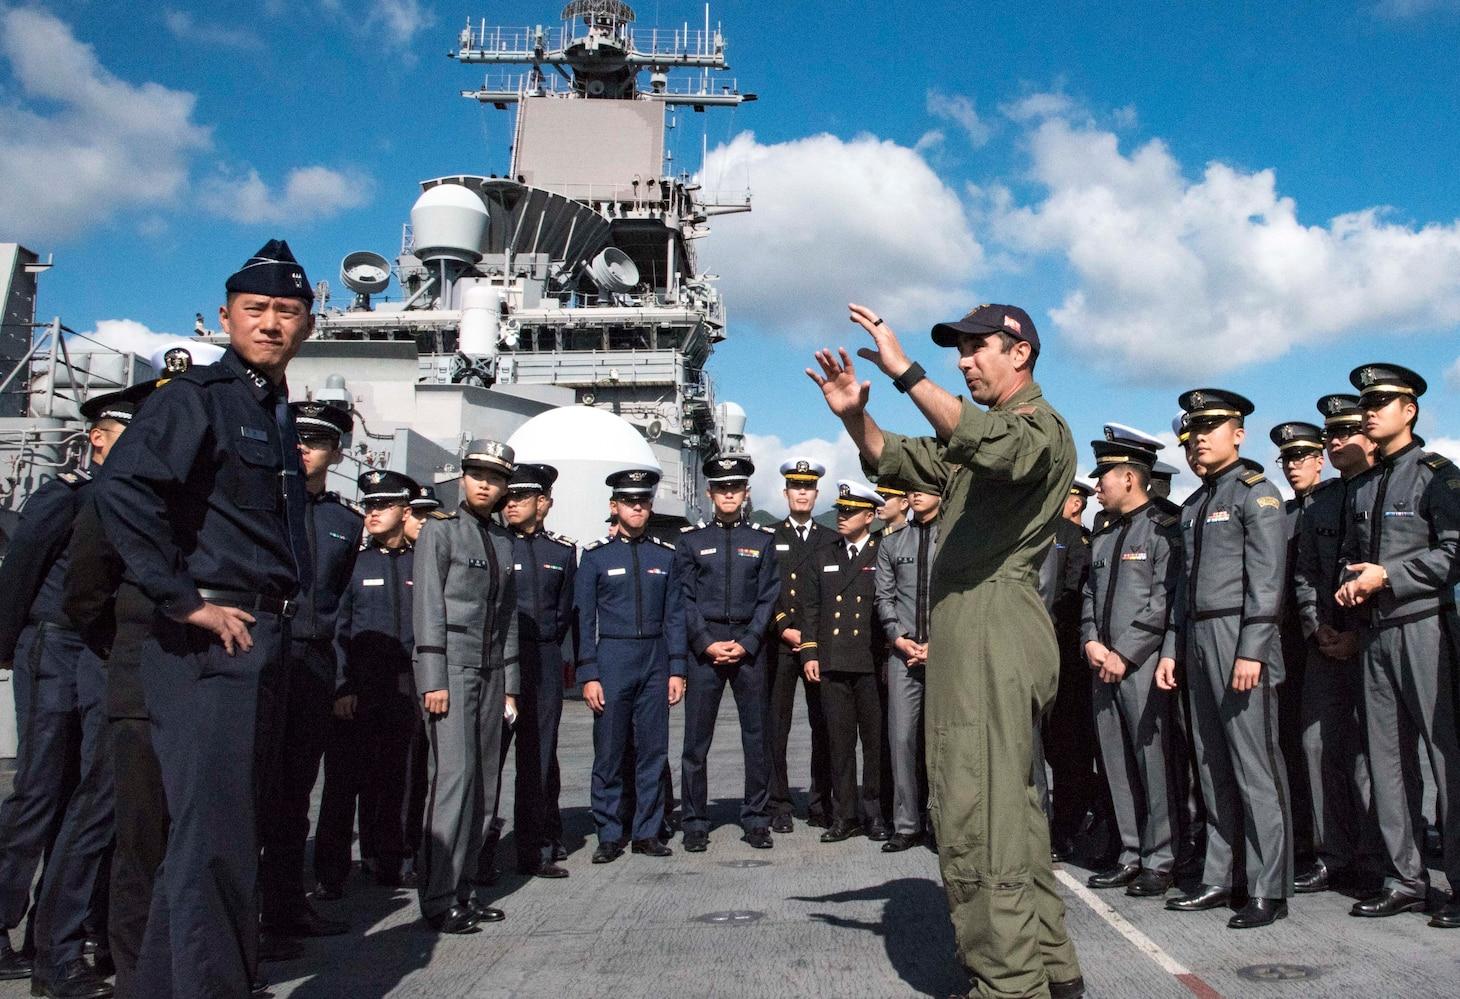 Republic of Korea midshipmen and cadets visit Wasp